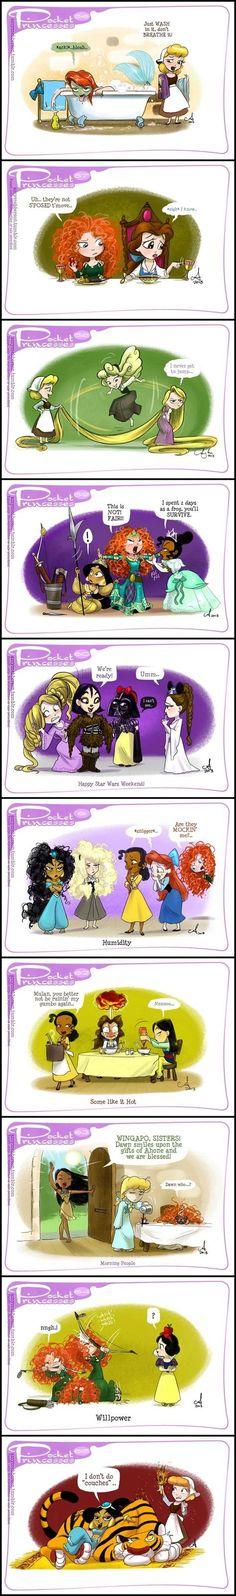 Comique princesses disney. N°2